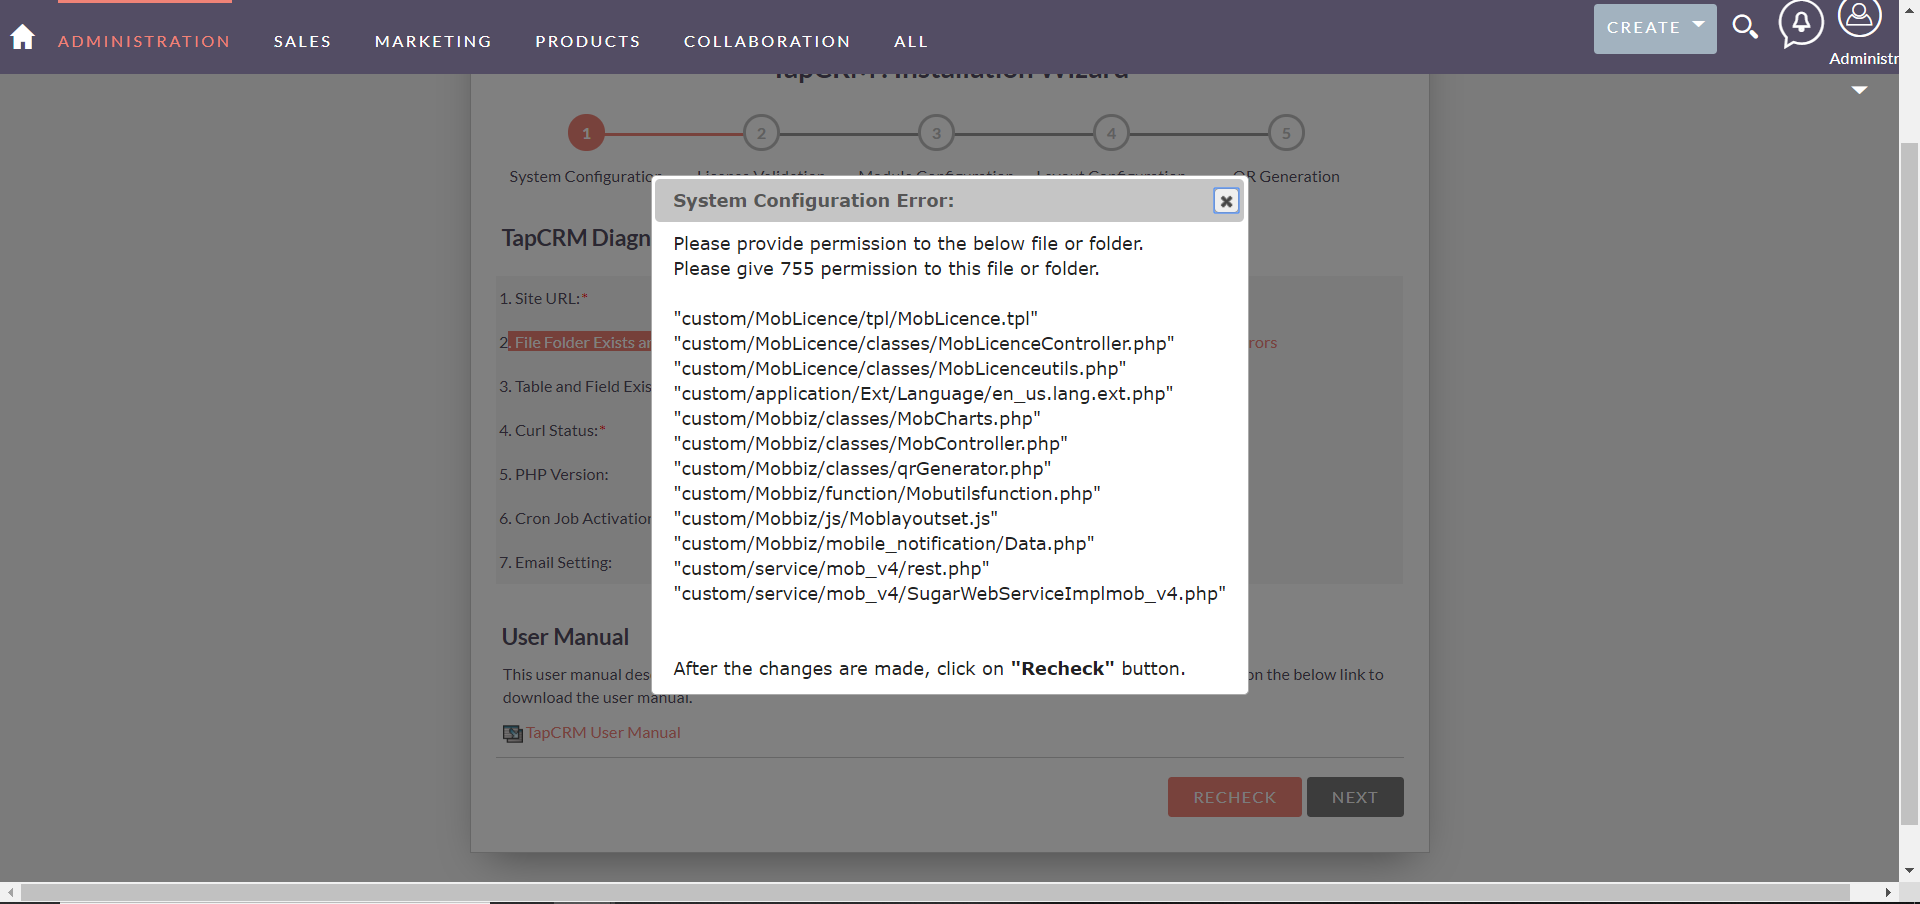 TapCRM_System_Config_Error.PNG